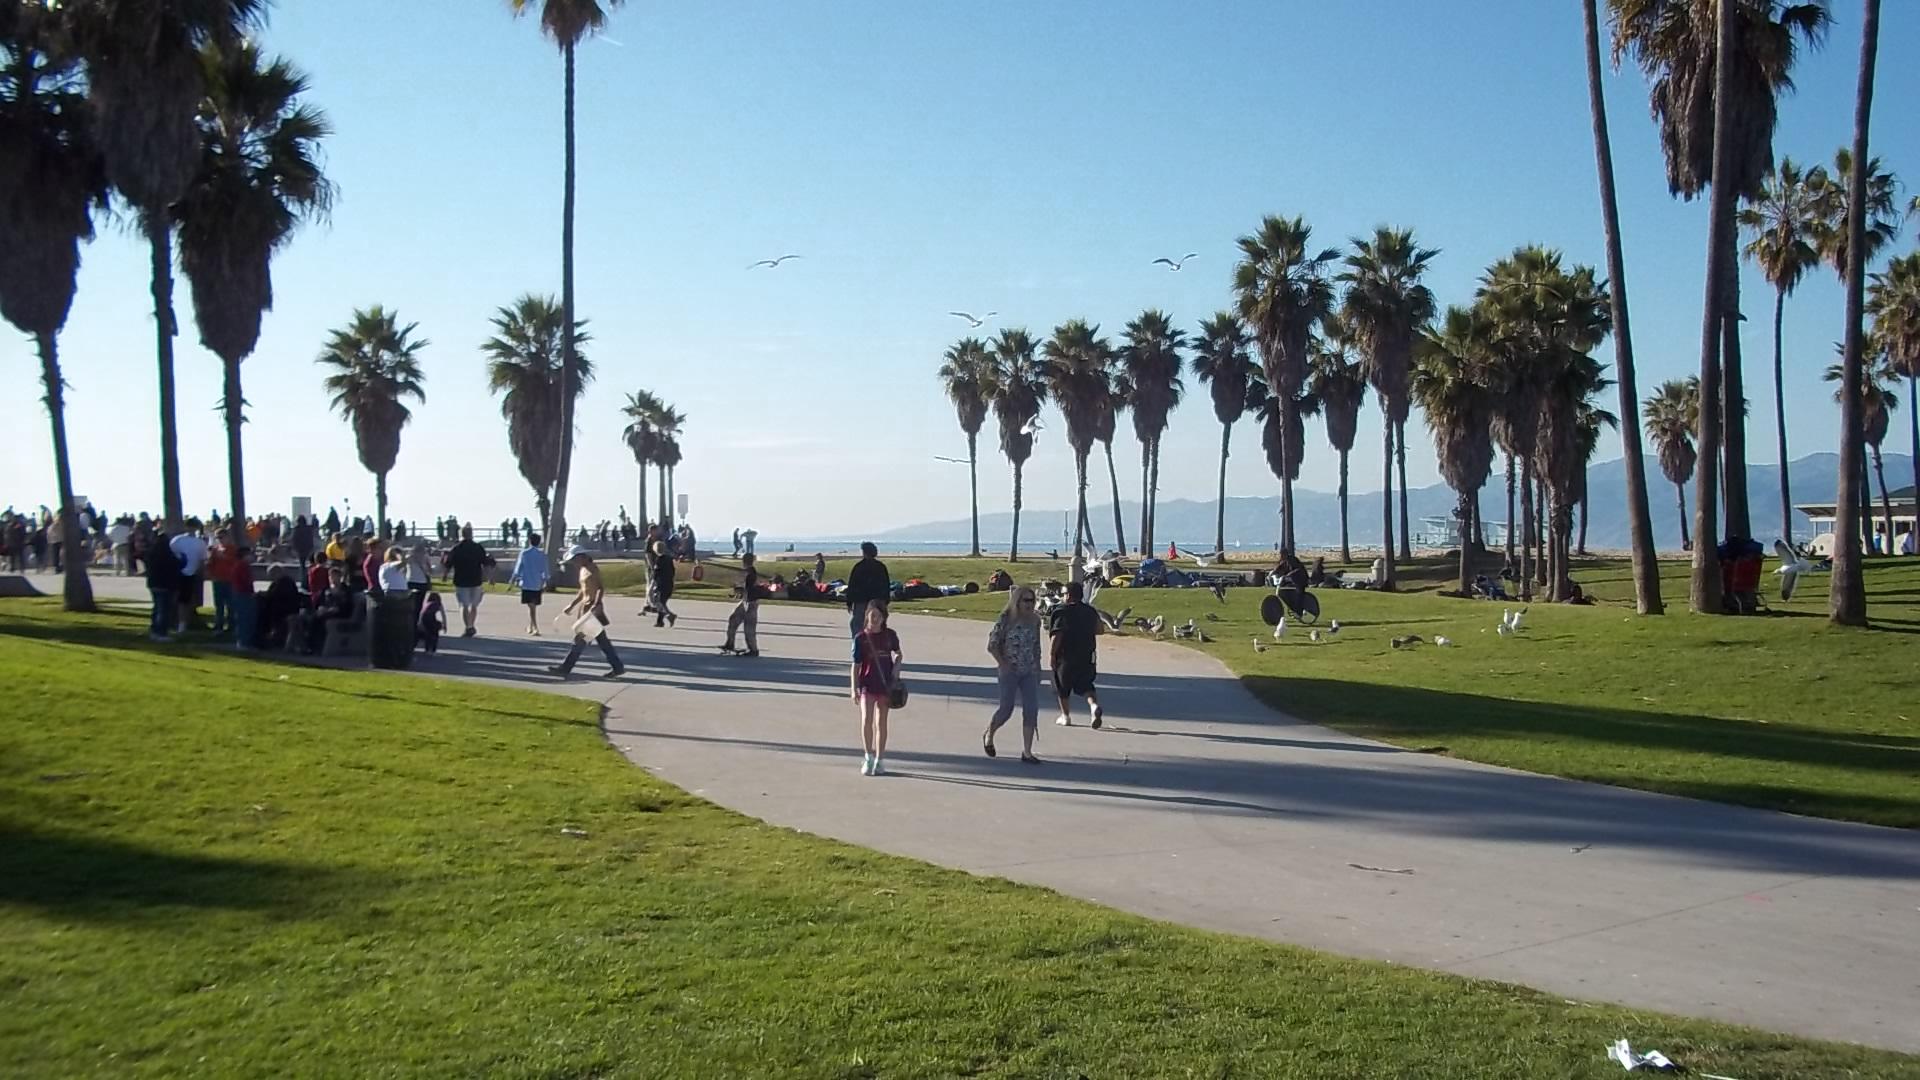 download image venice beach - photo #45